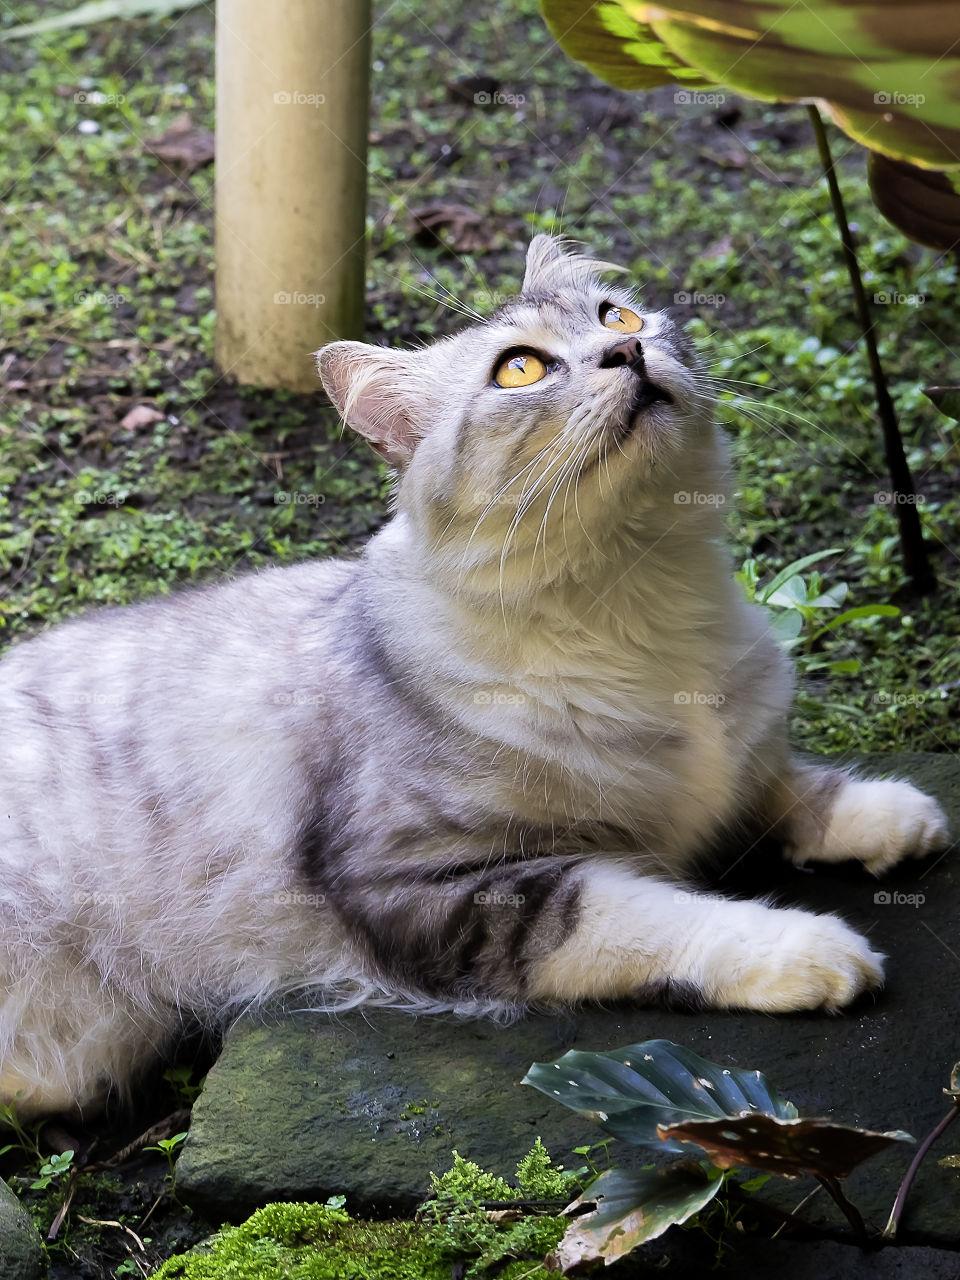 Praying for the catnip